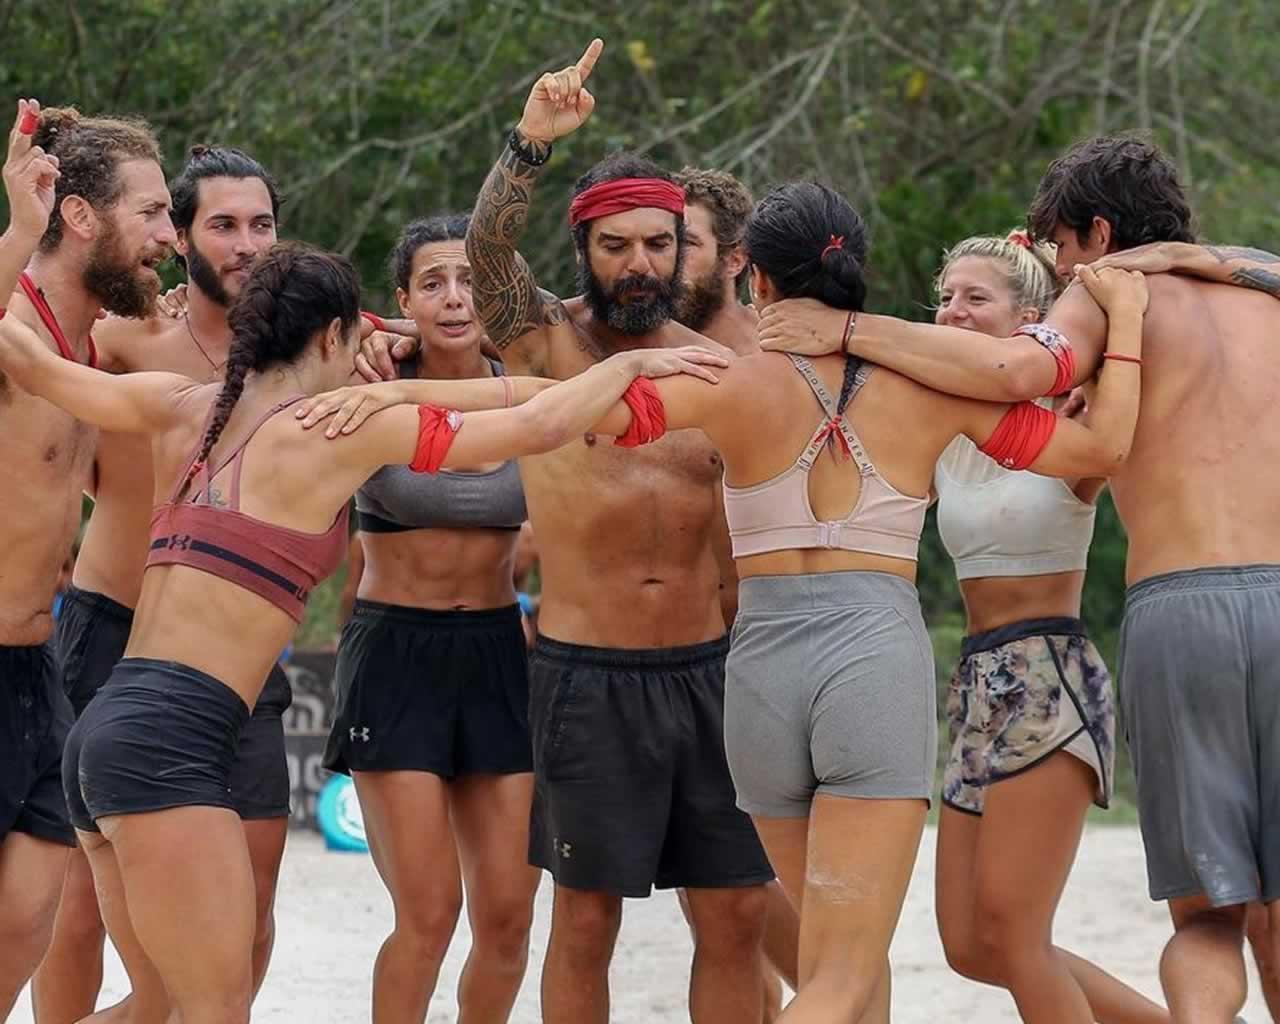 Survivor spoiler διαρροή 21/4: Γι' αυτό δεν αποχωρεί οικειοθελώς ο Τριαντάφυλλος (video)